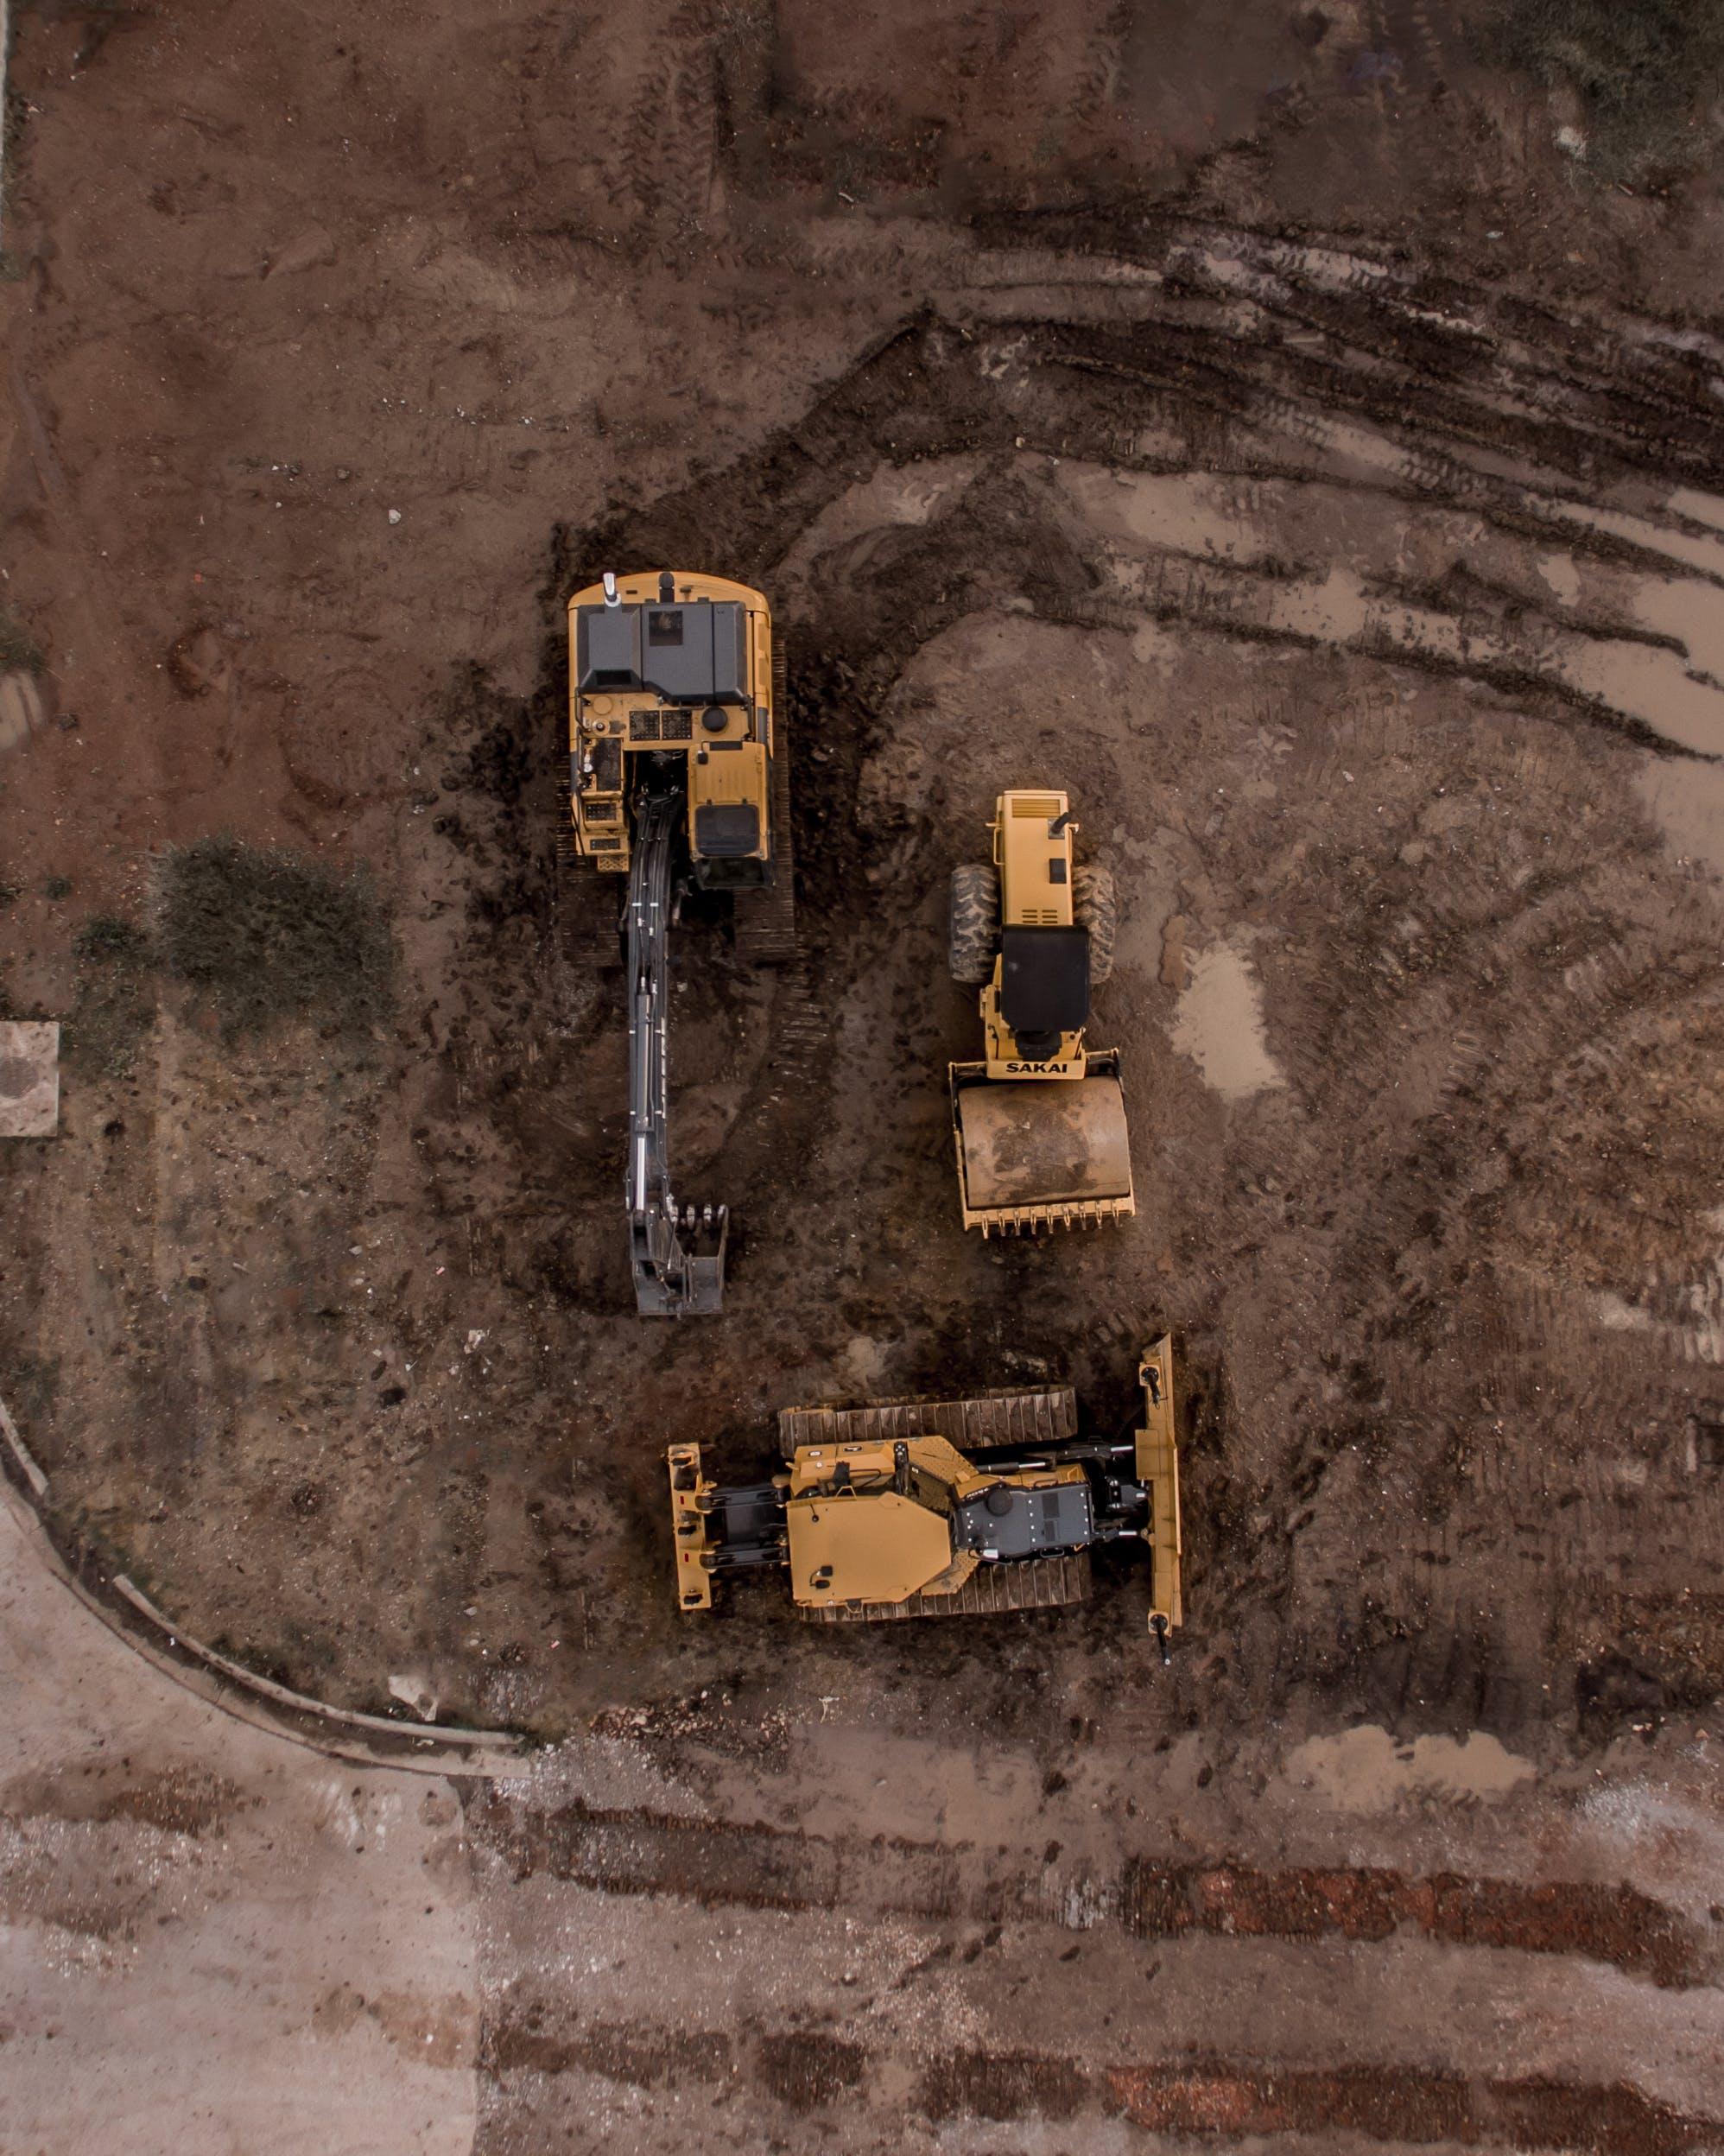 Aerial Photo Of Excavator, Road Roller, And Bulldozer